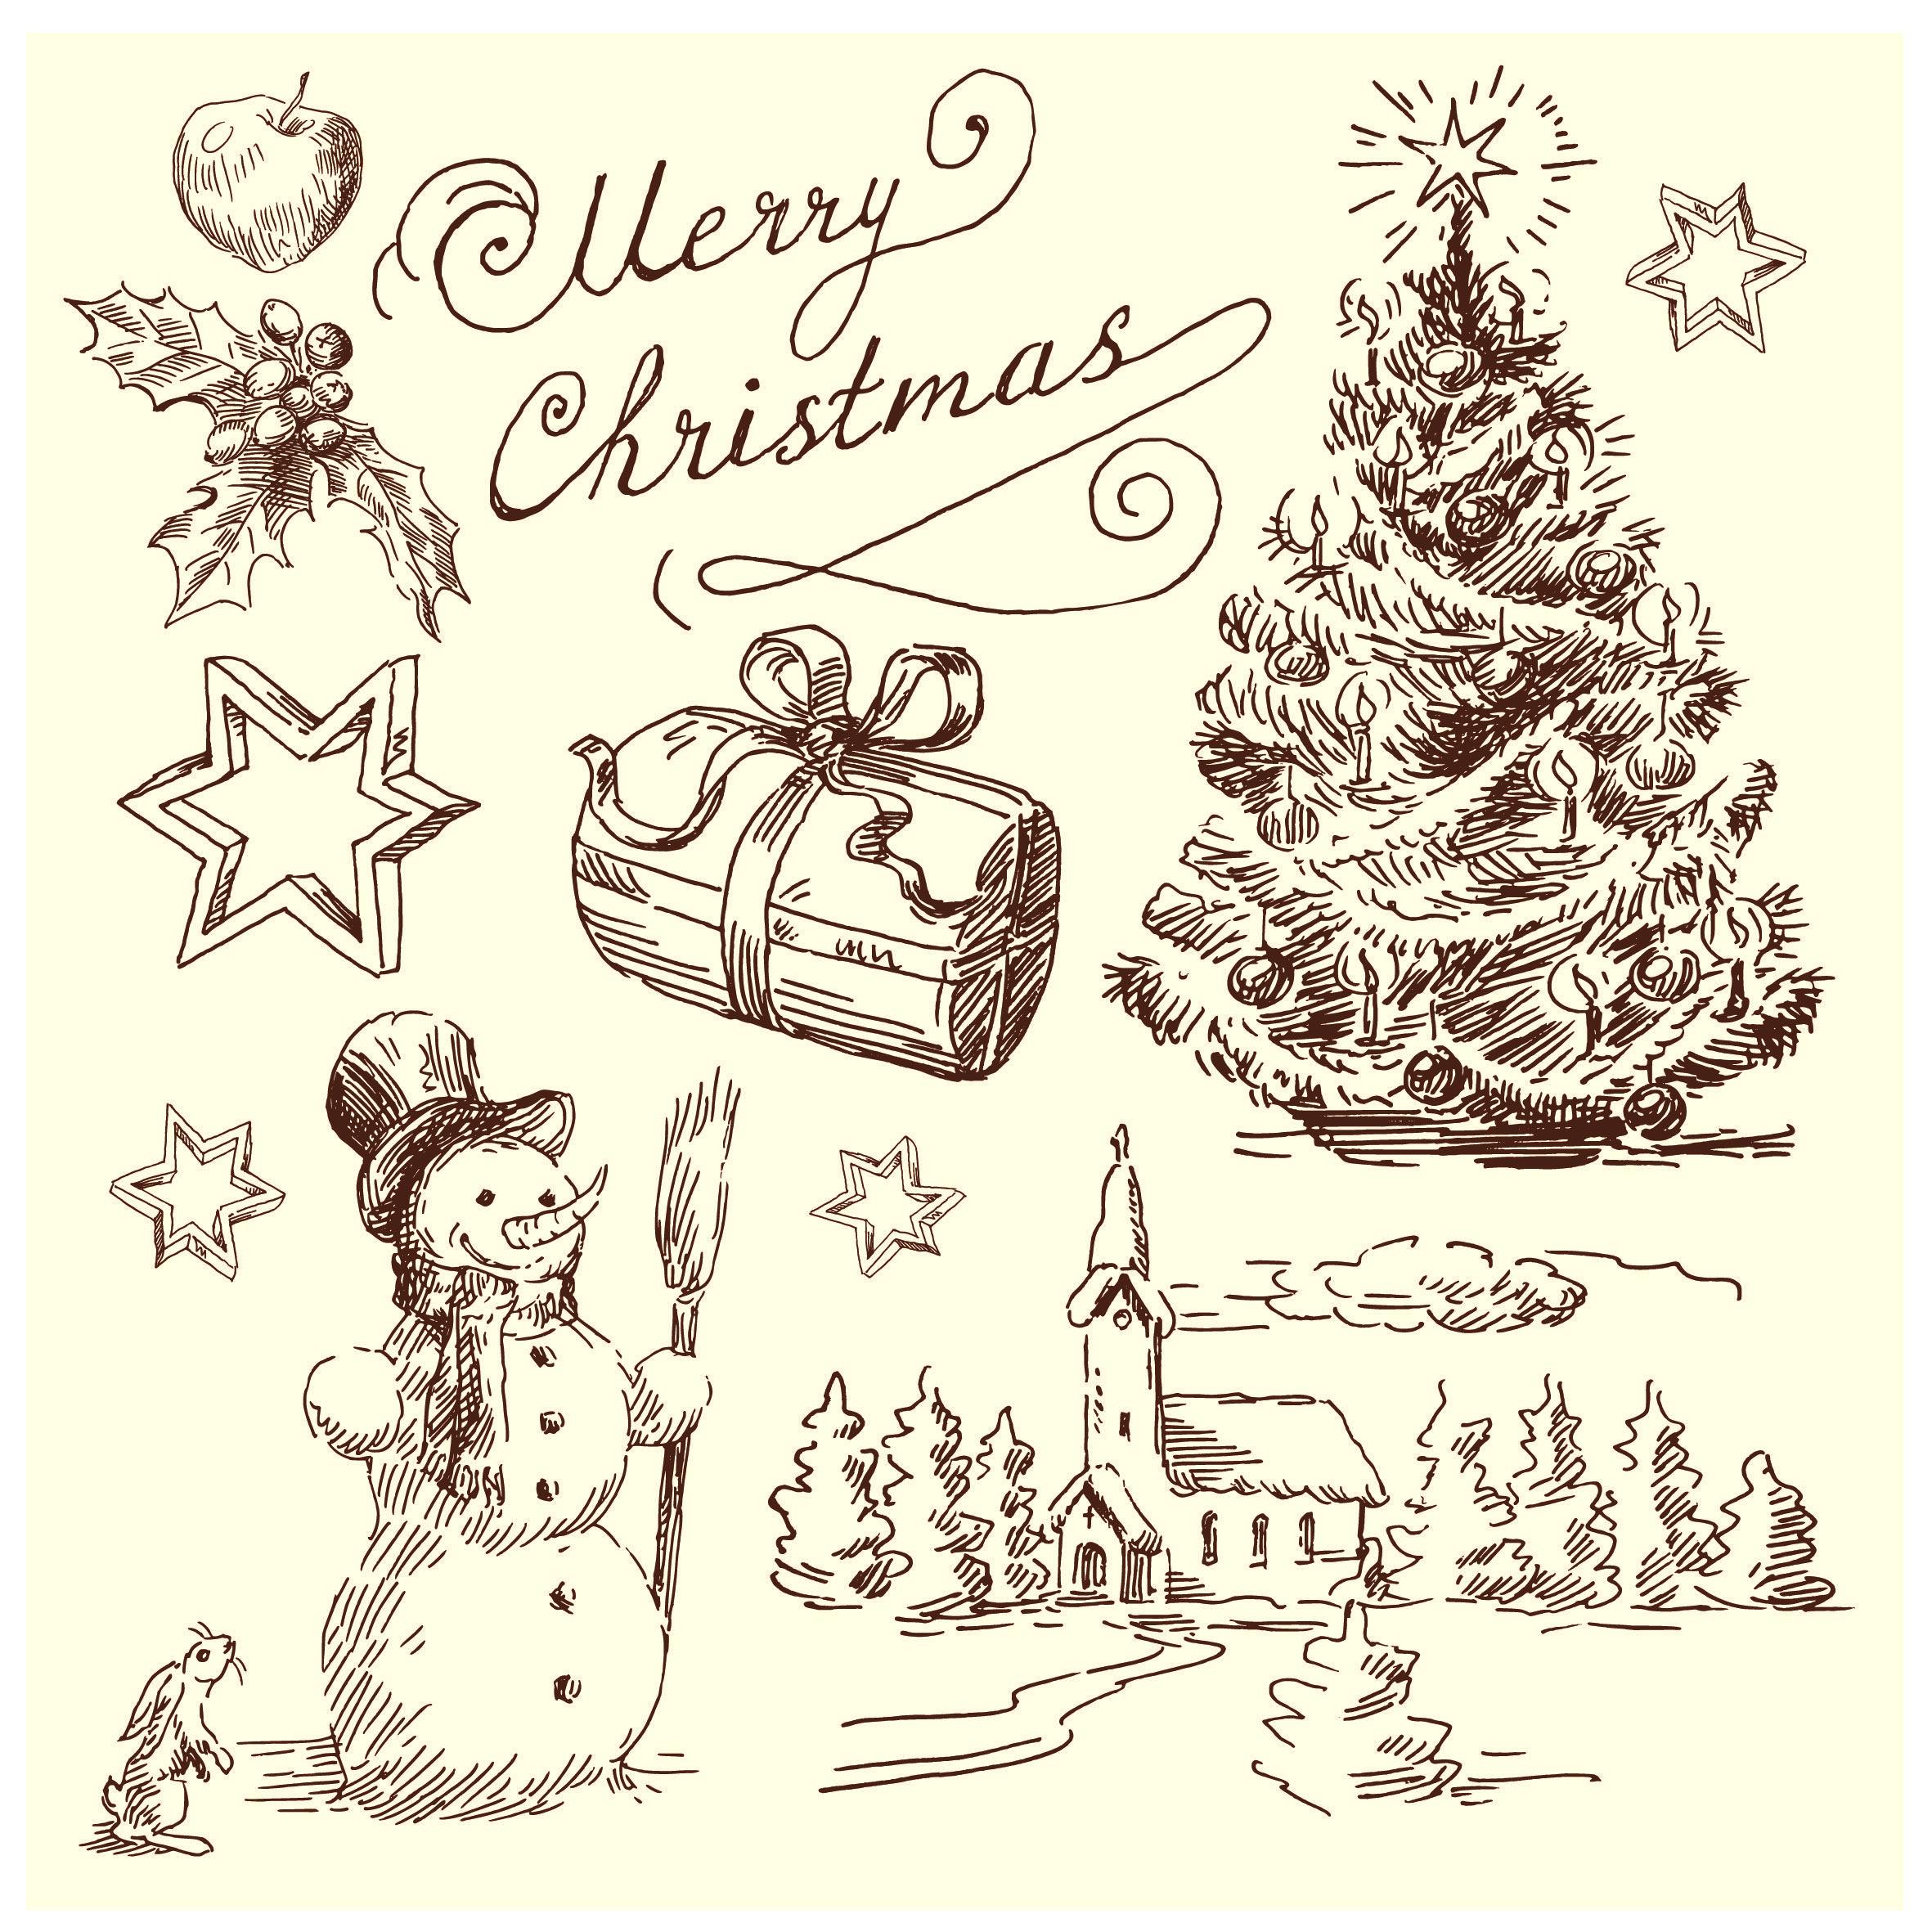 Vintage Christmas Ornament Illustration Vintage Christmas Illustration